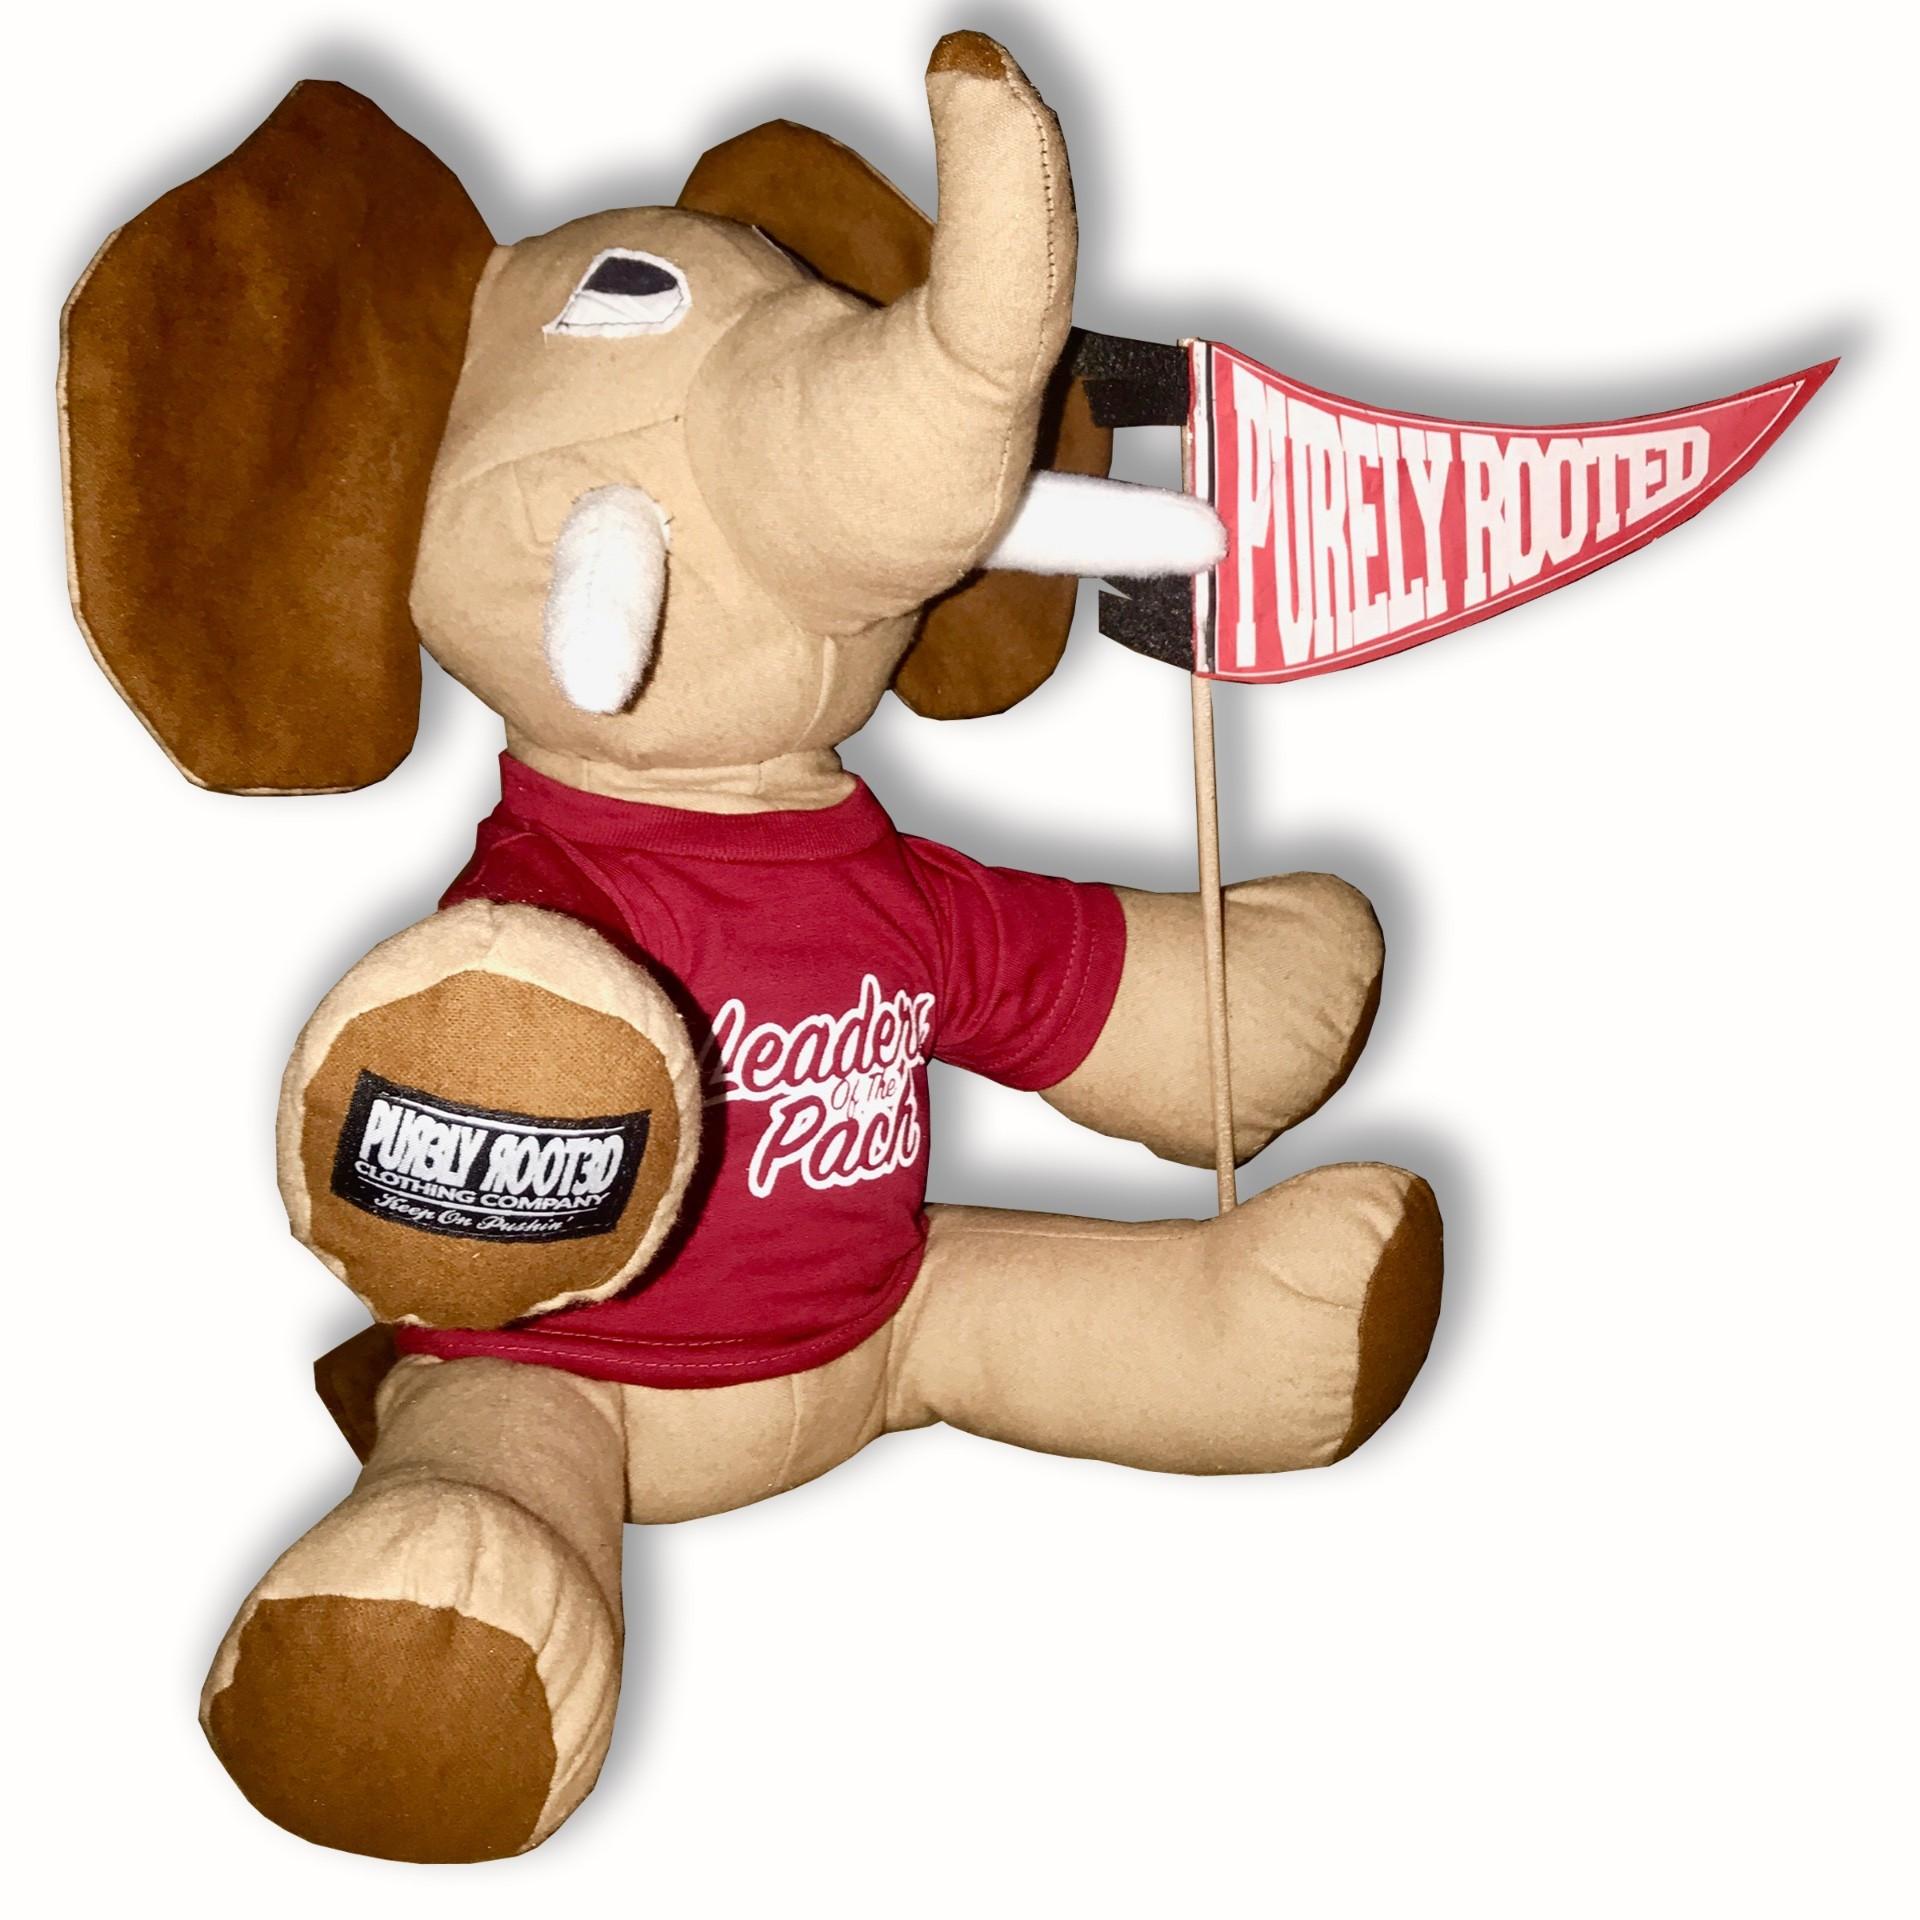 Tusk Mascot Stuffed Elephant with Pennant